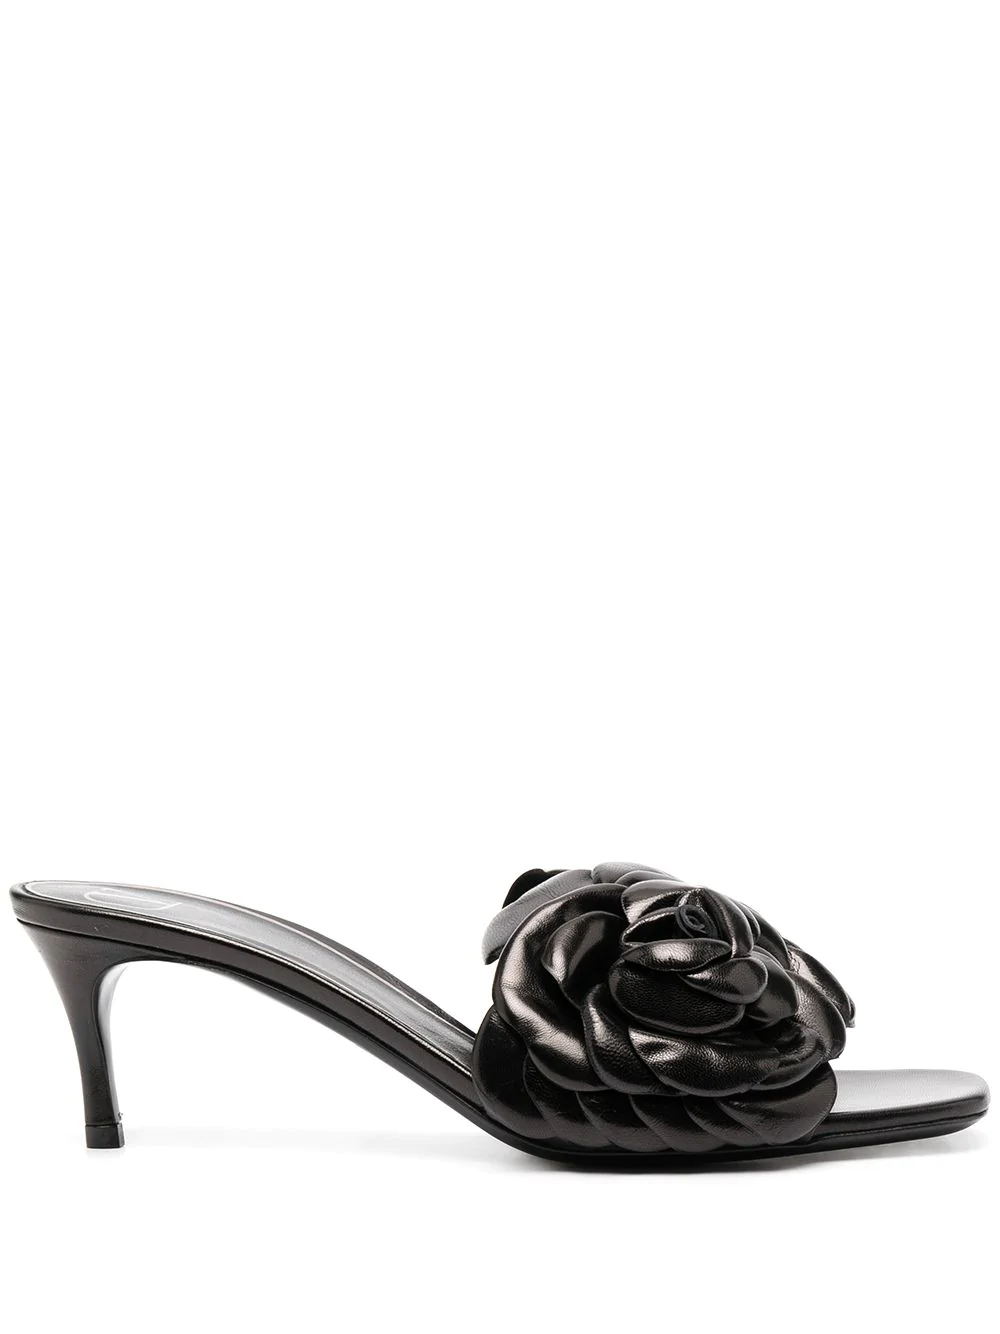 Valentino Garavani 03 Rose Edition Slide Sandals 1602лв